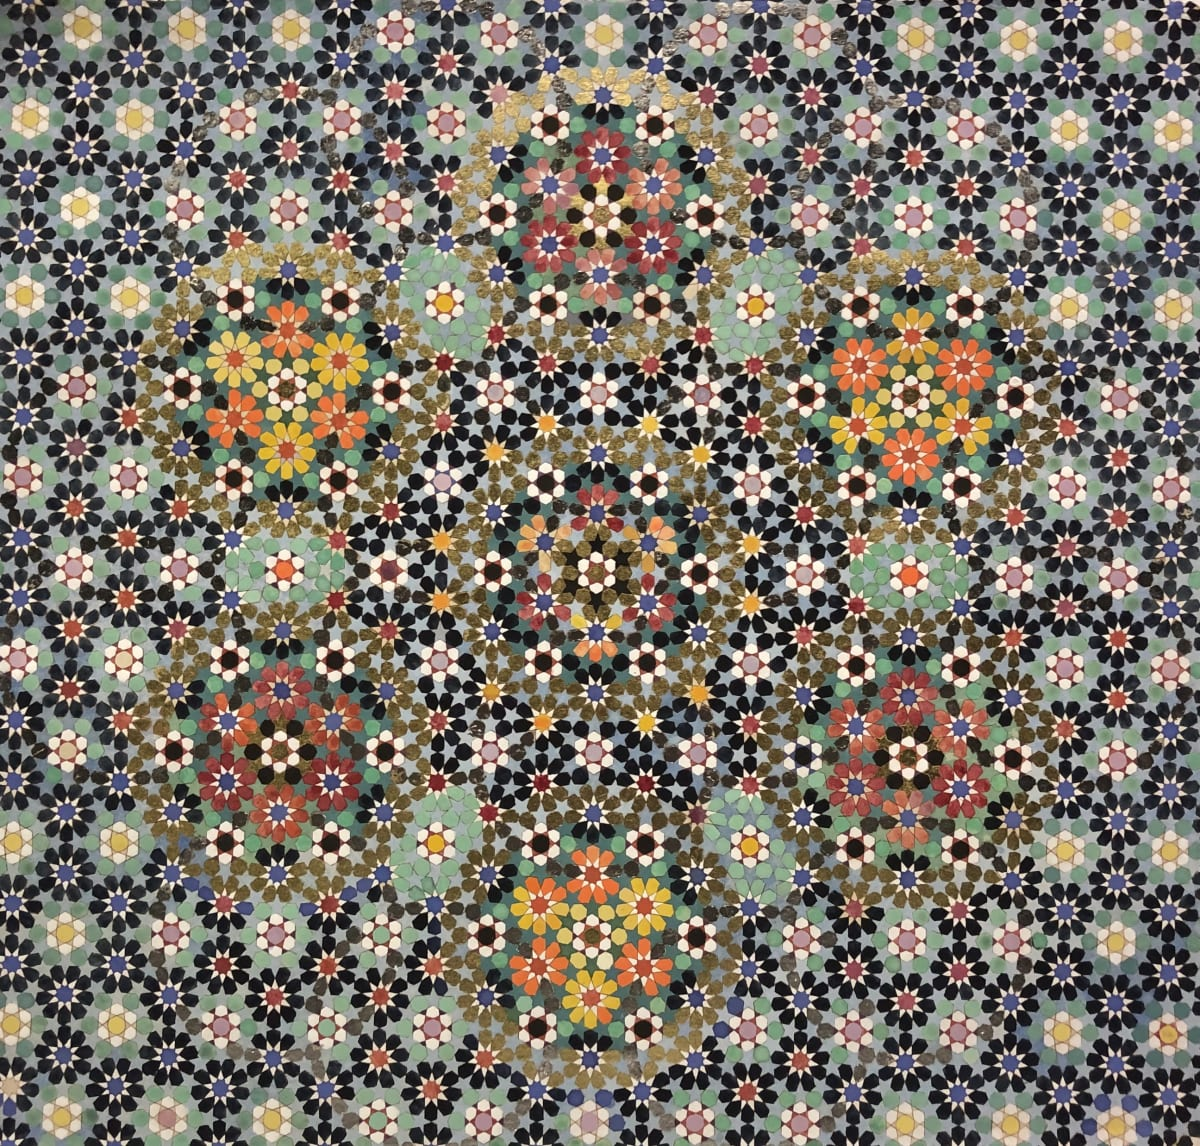 Elisabeth Deane Little Waves, 2020 Italian gold leaf, platinum leaf, natural pigments and Arabic gum on handmade Indian hemp paper 52.6 x 49.6 cm 20 3/4 x 19 1/2 in